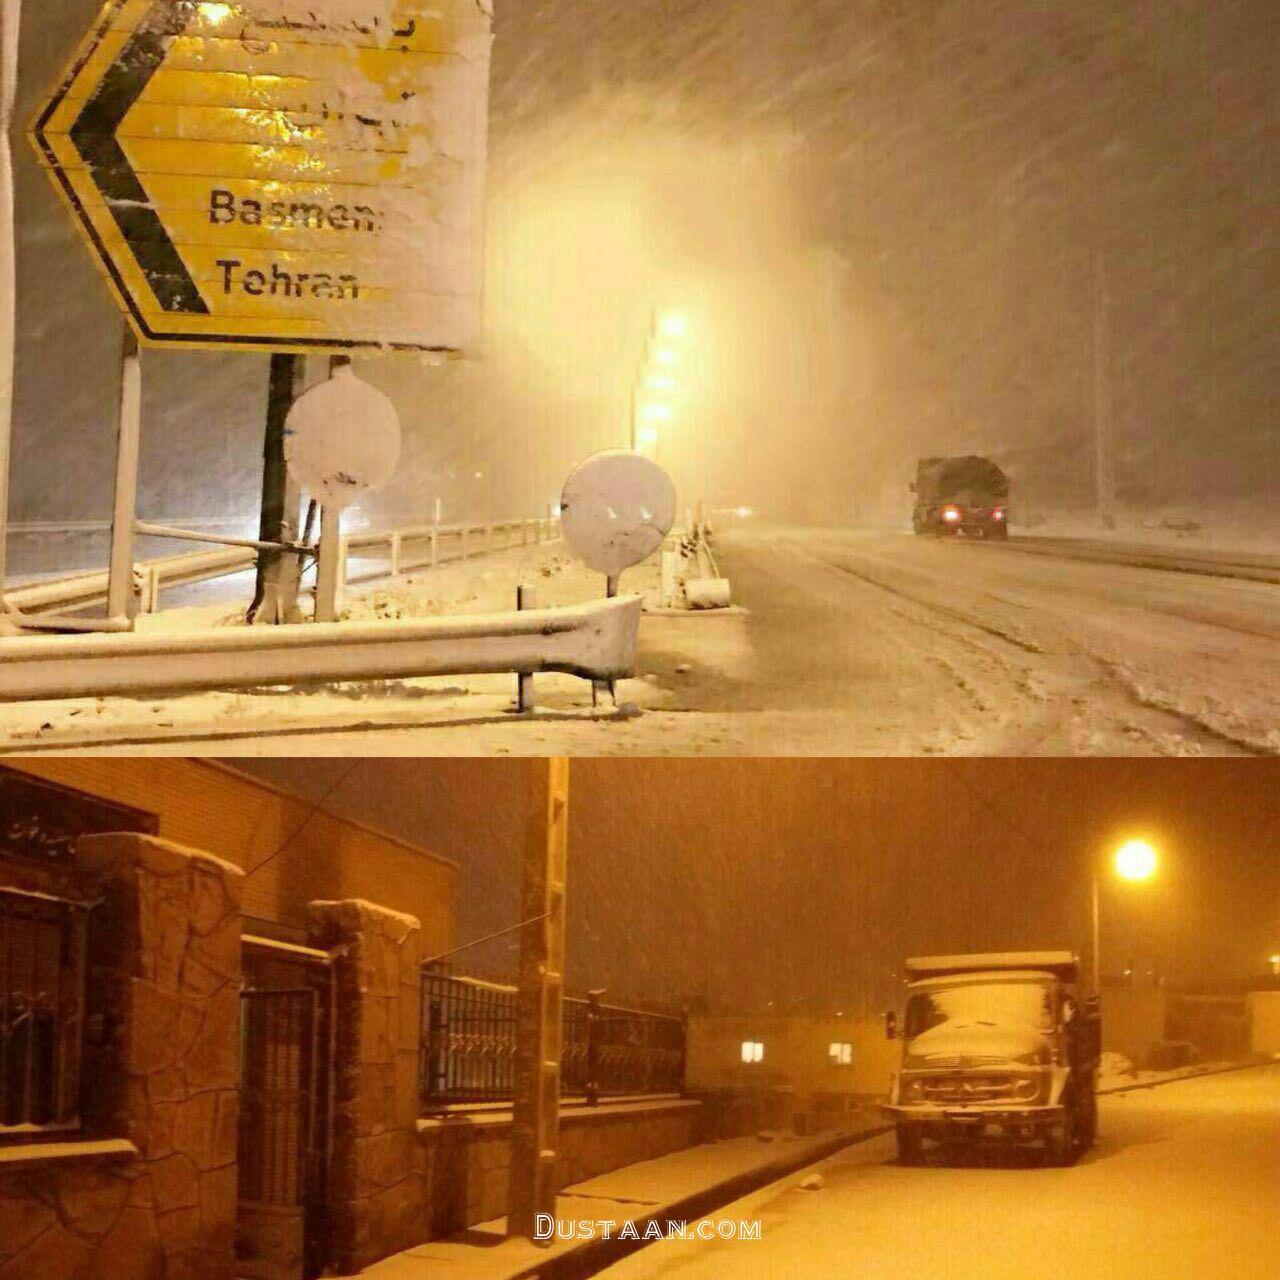 www.dustaan.com برف سنگین پاییزی در تبریز +عکس